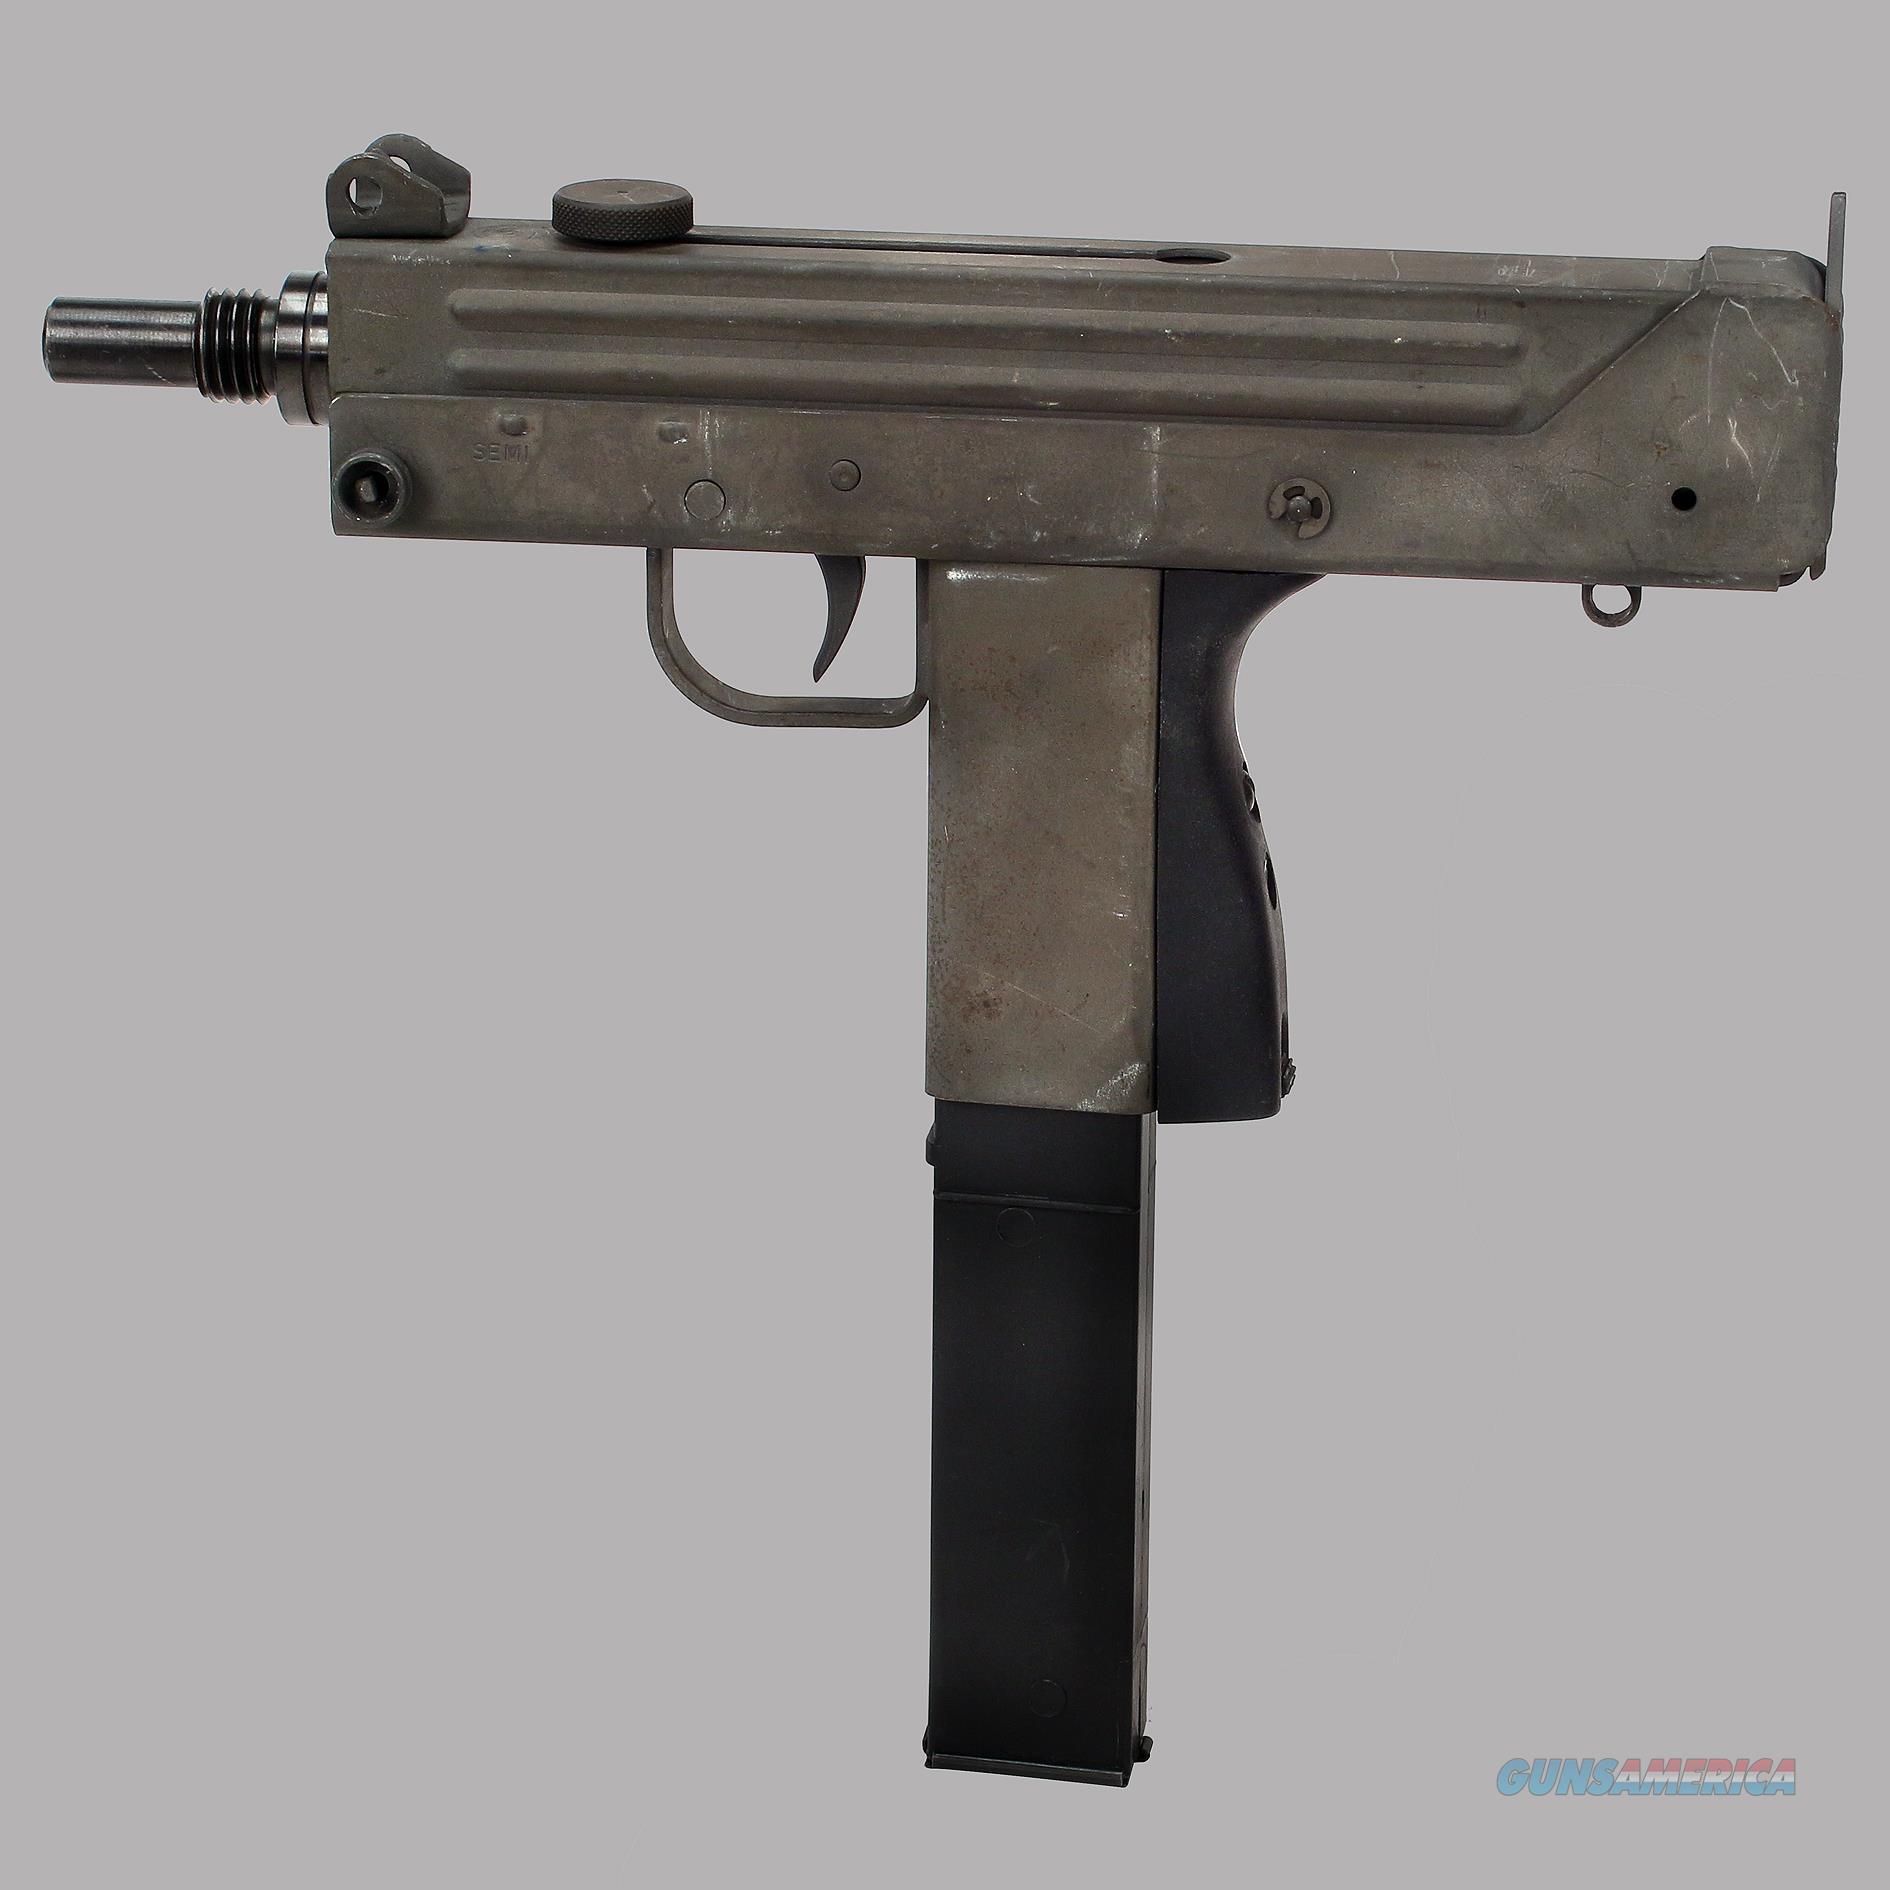 Cobray M11 Nine Pistol For Sale